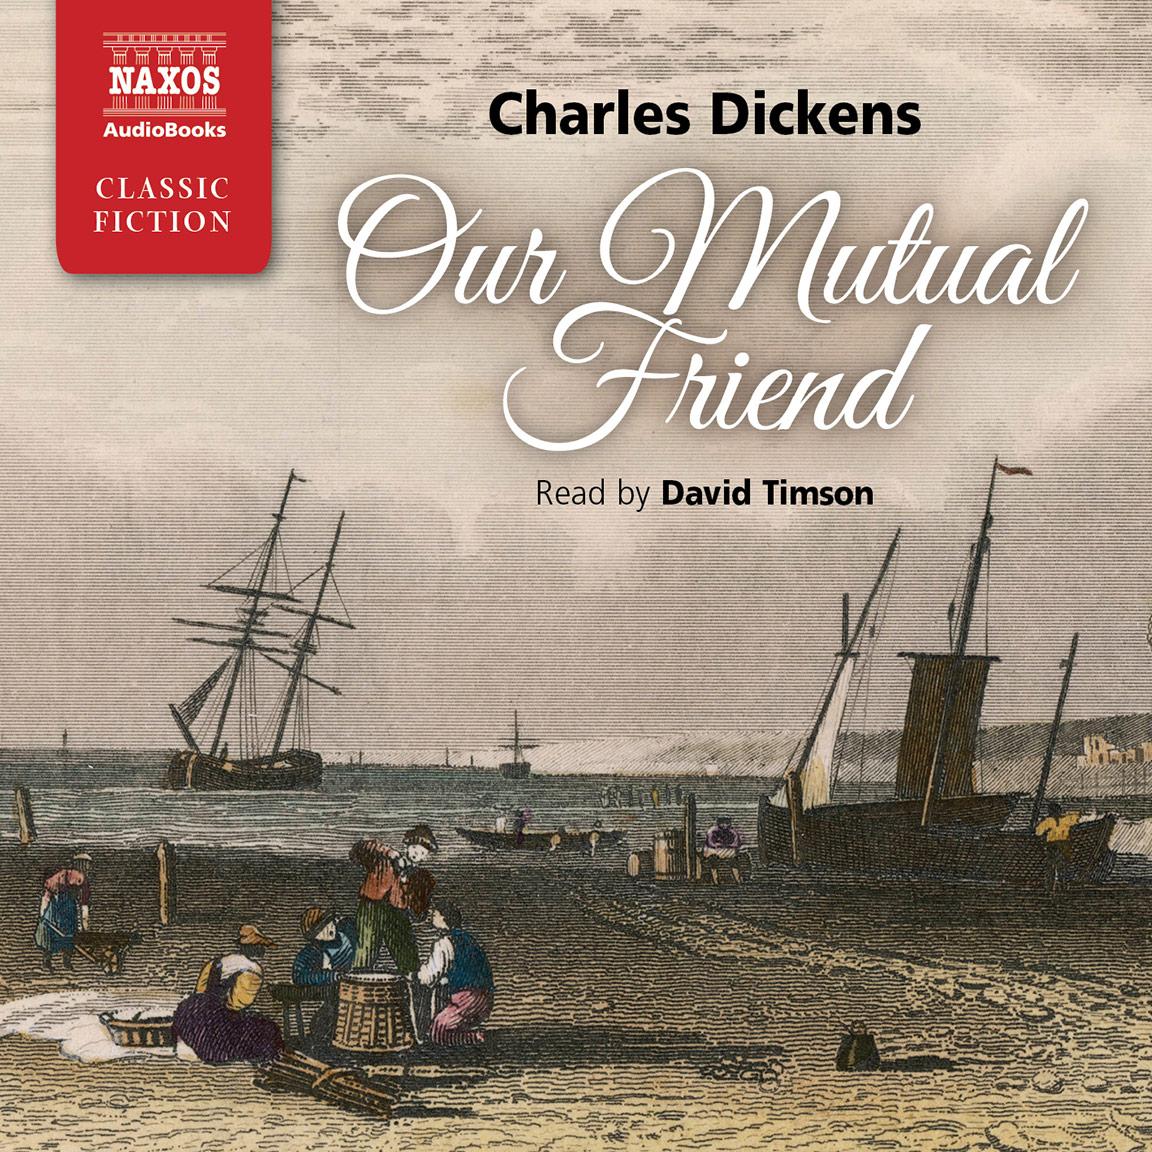 Our Mutual Friend (abridged)